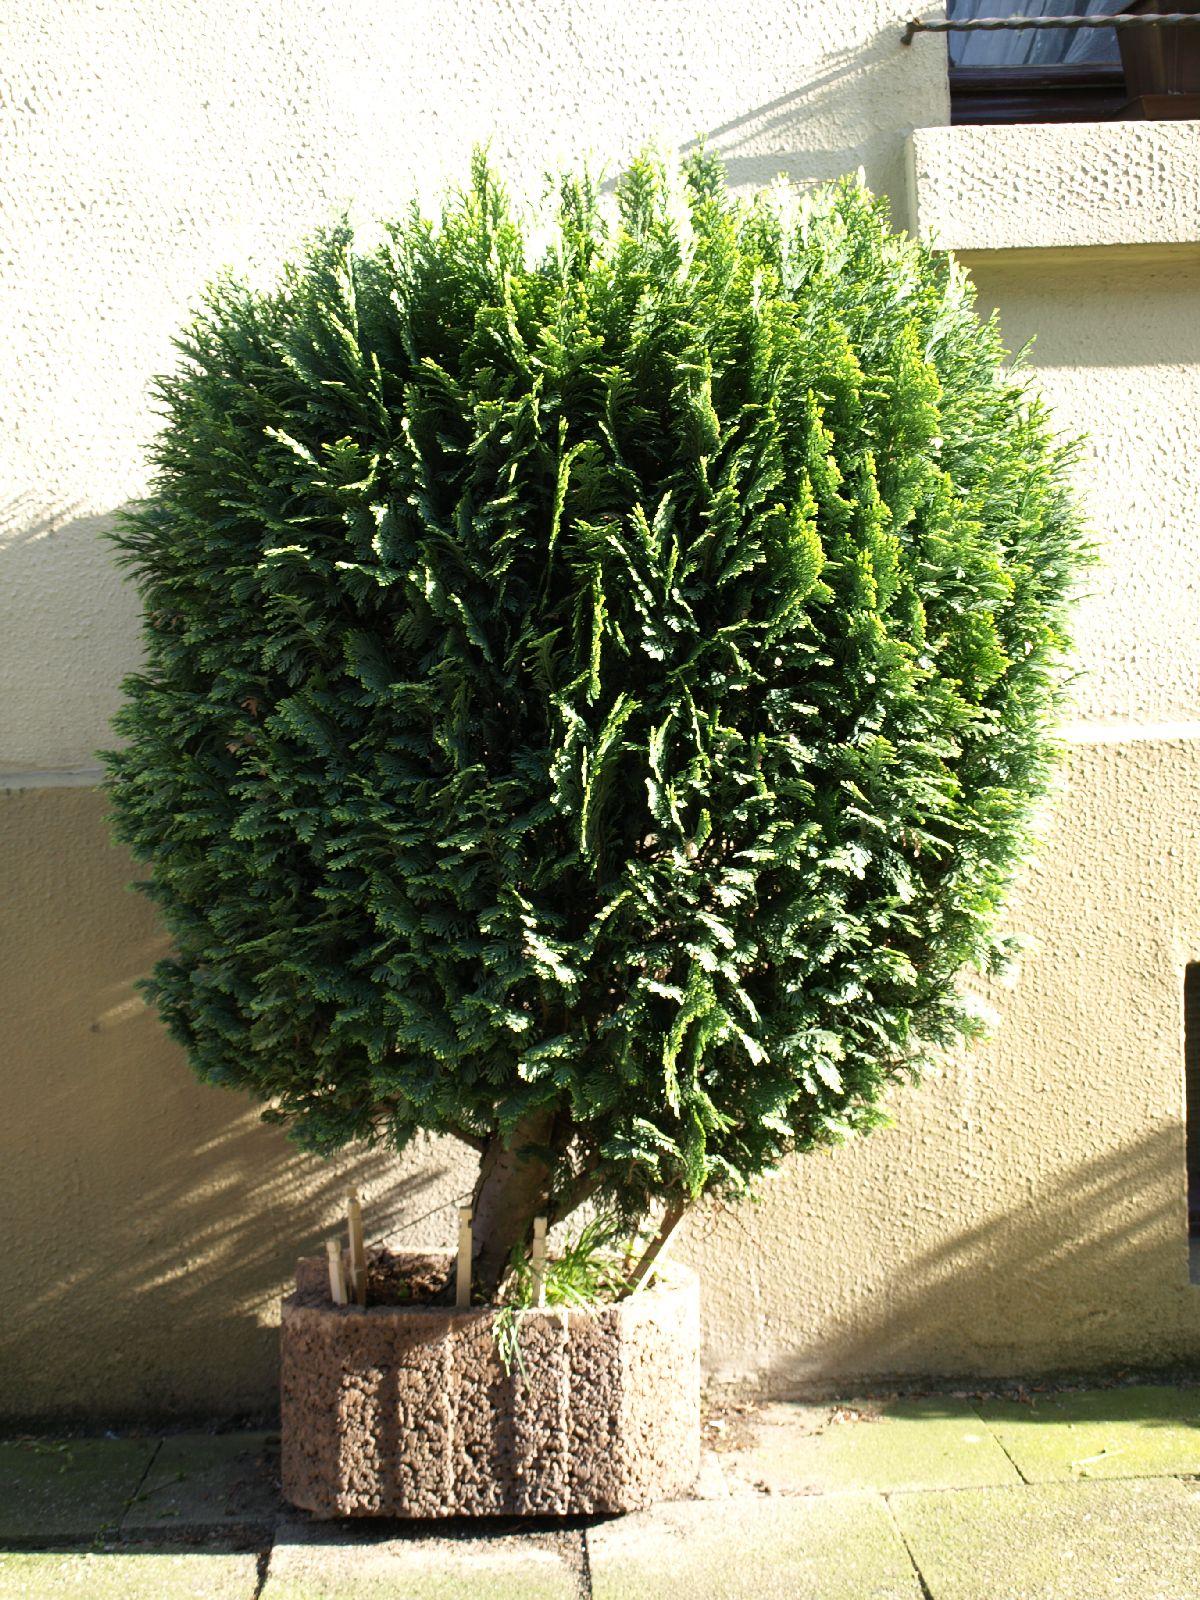 Plants-Trees_Photo_Texture_B_P5072578